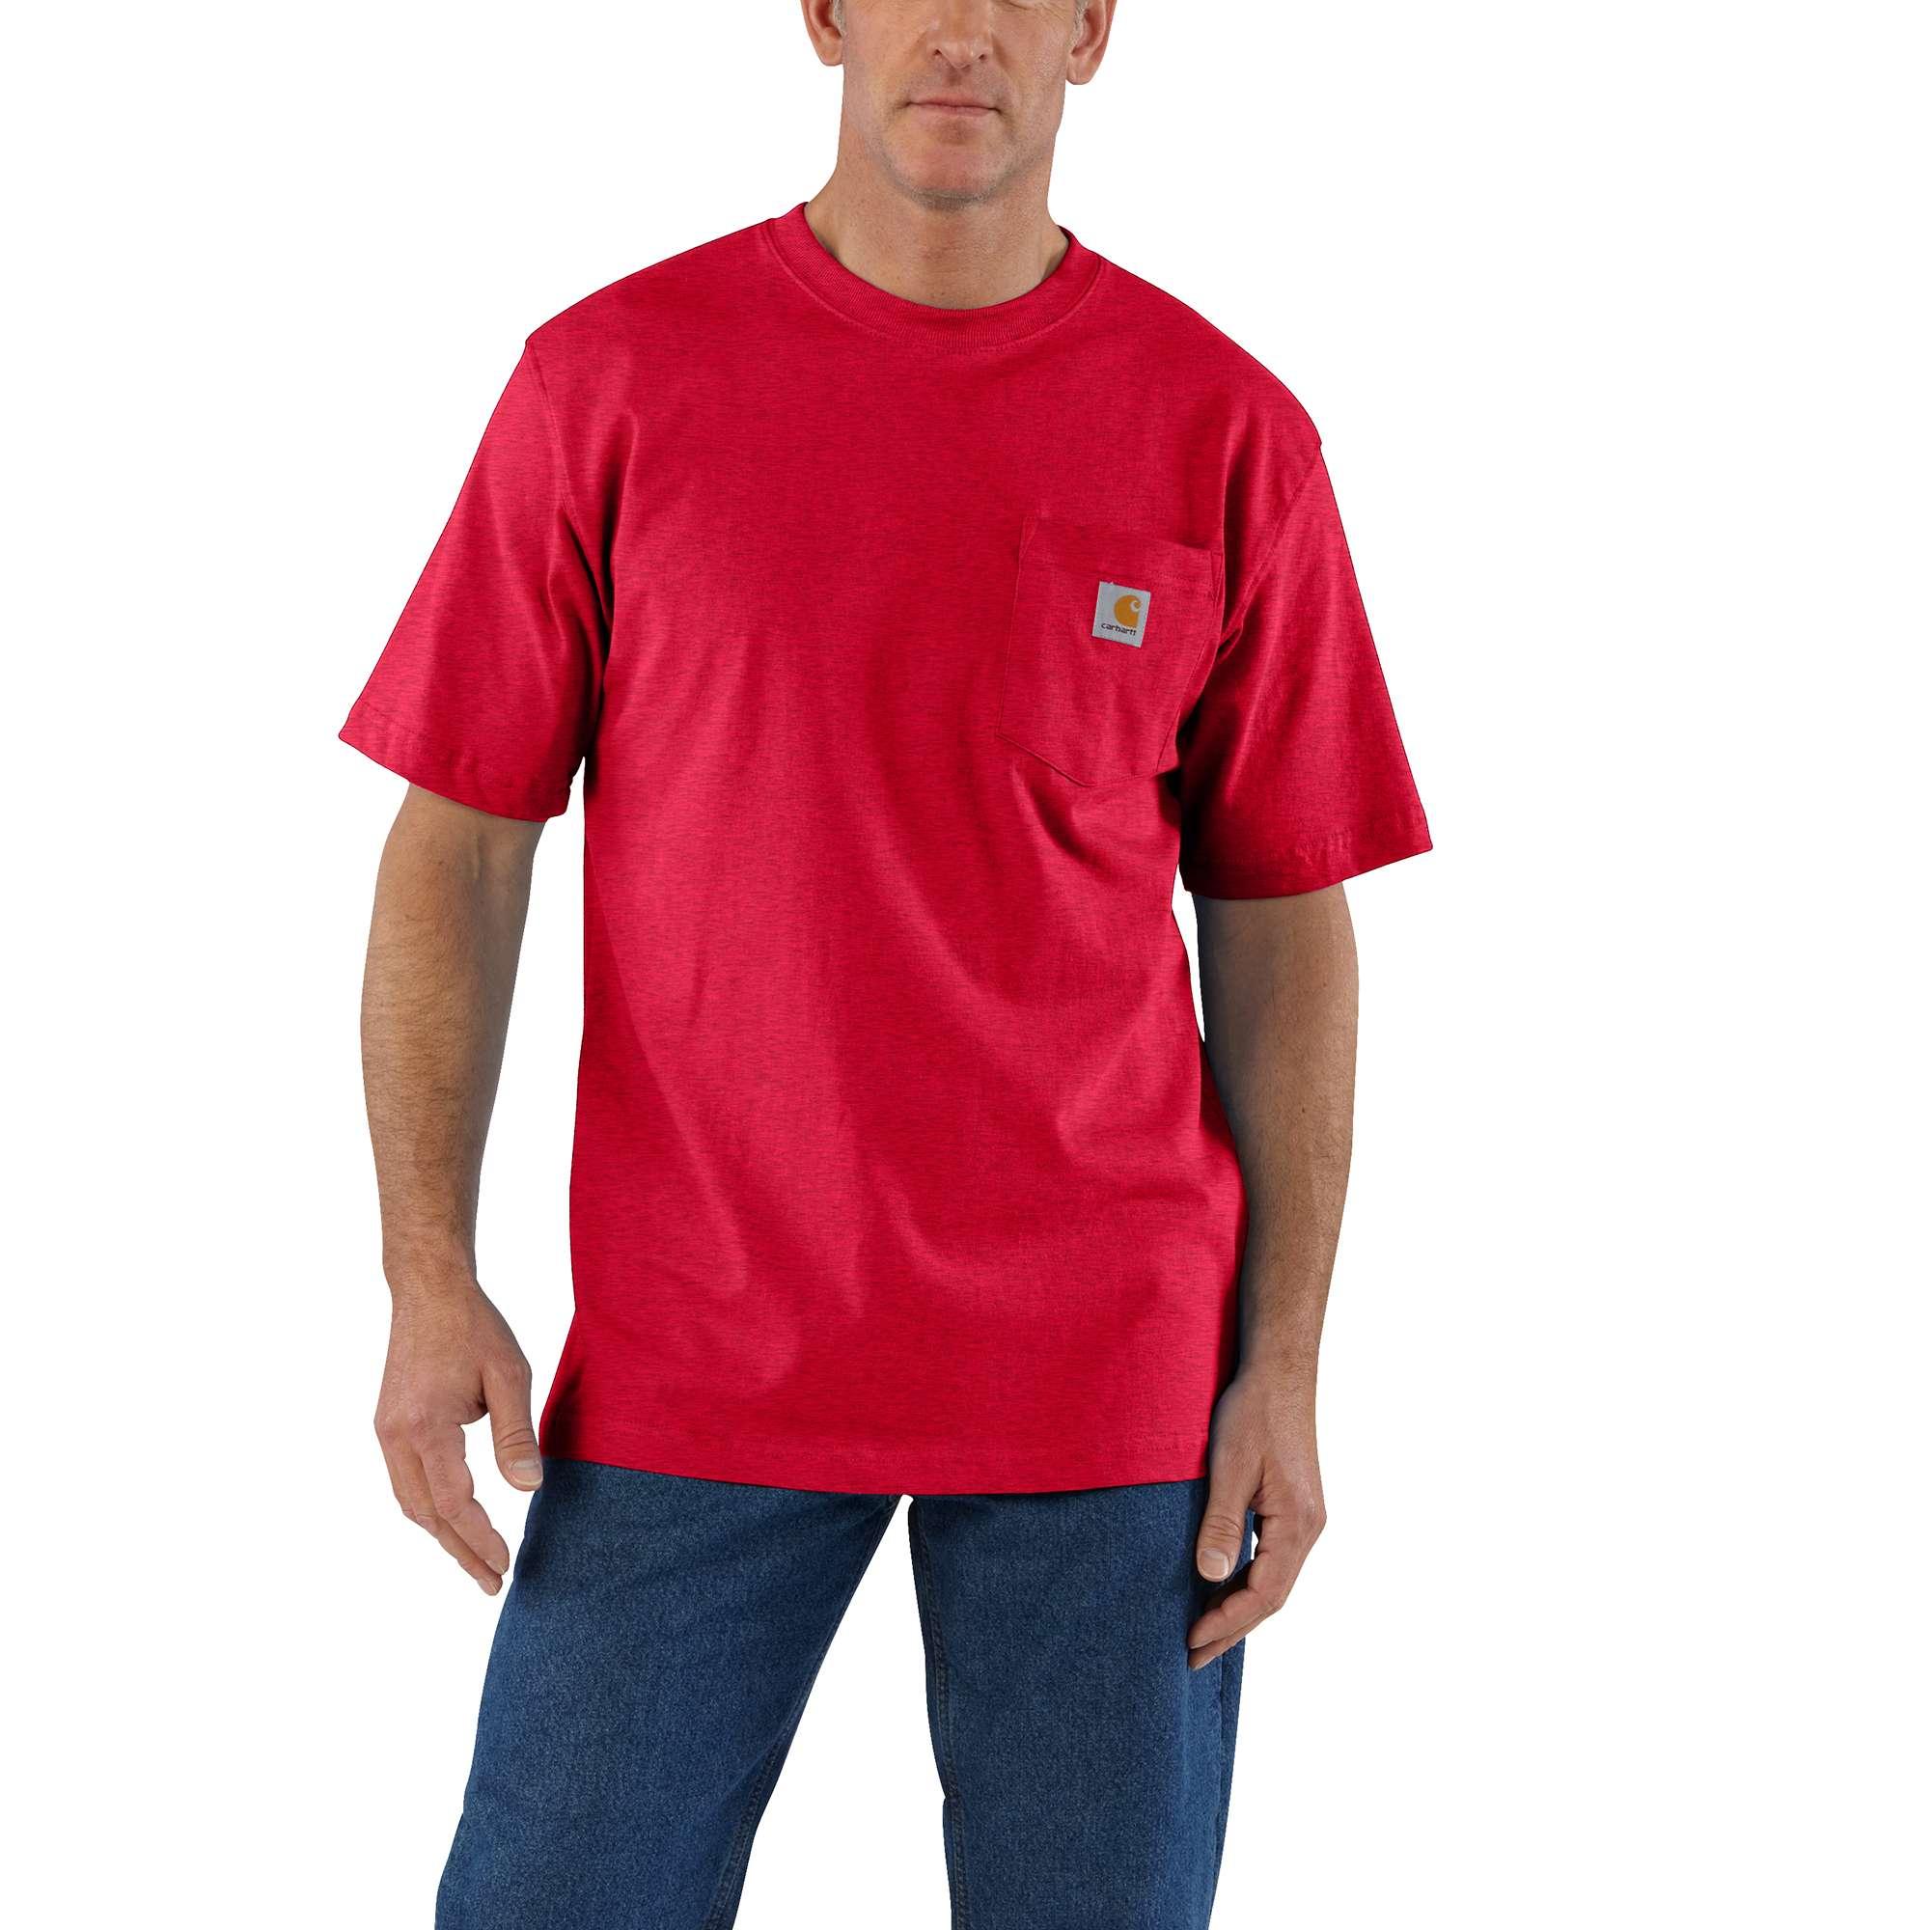 Men's Workwear Pocket Tee, Red/Grey, swatch